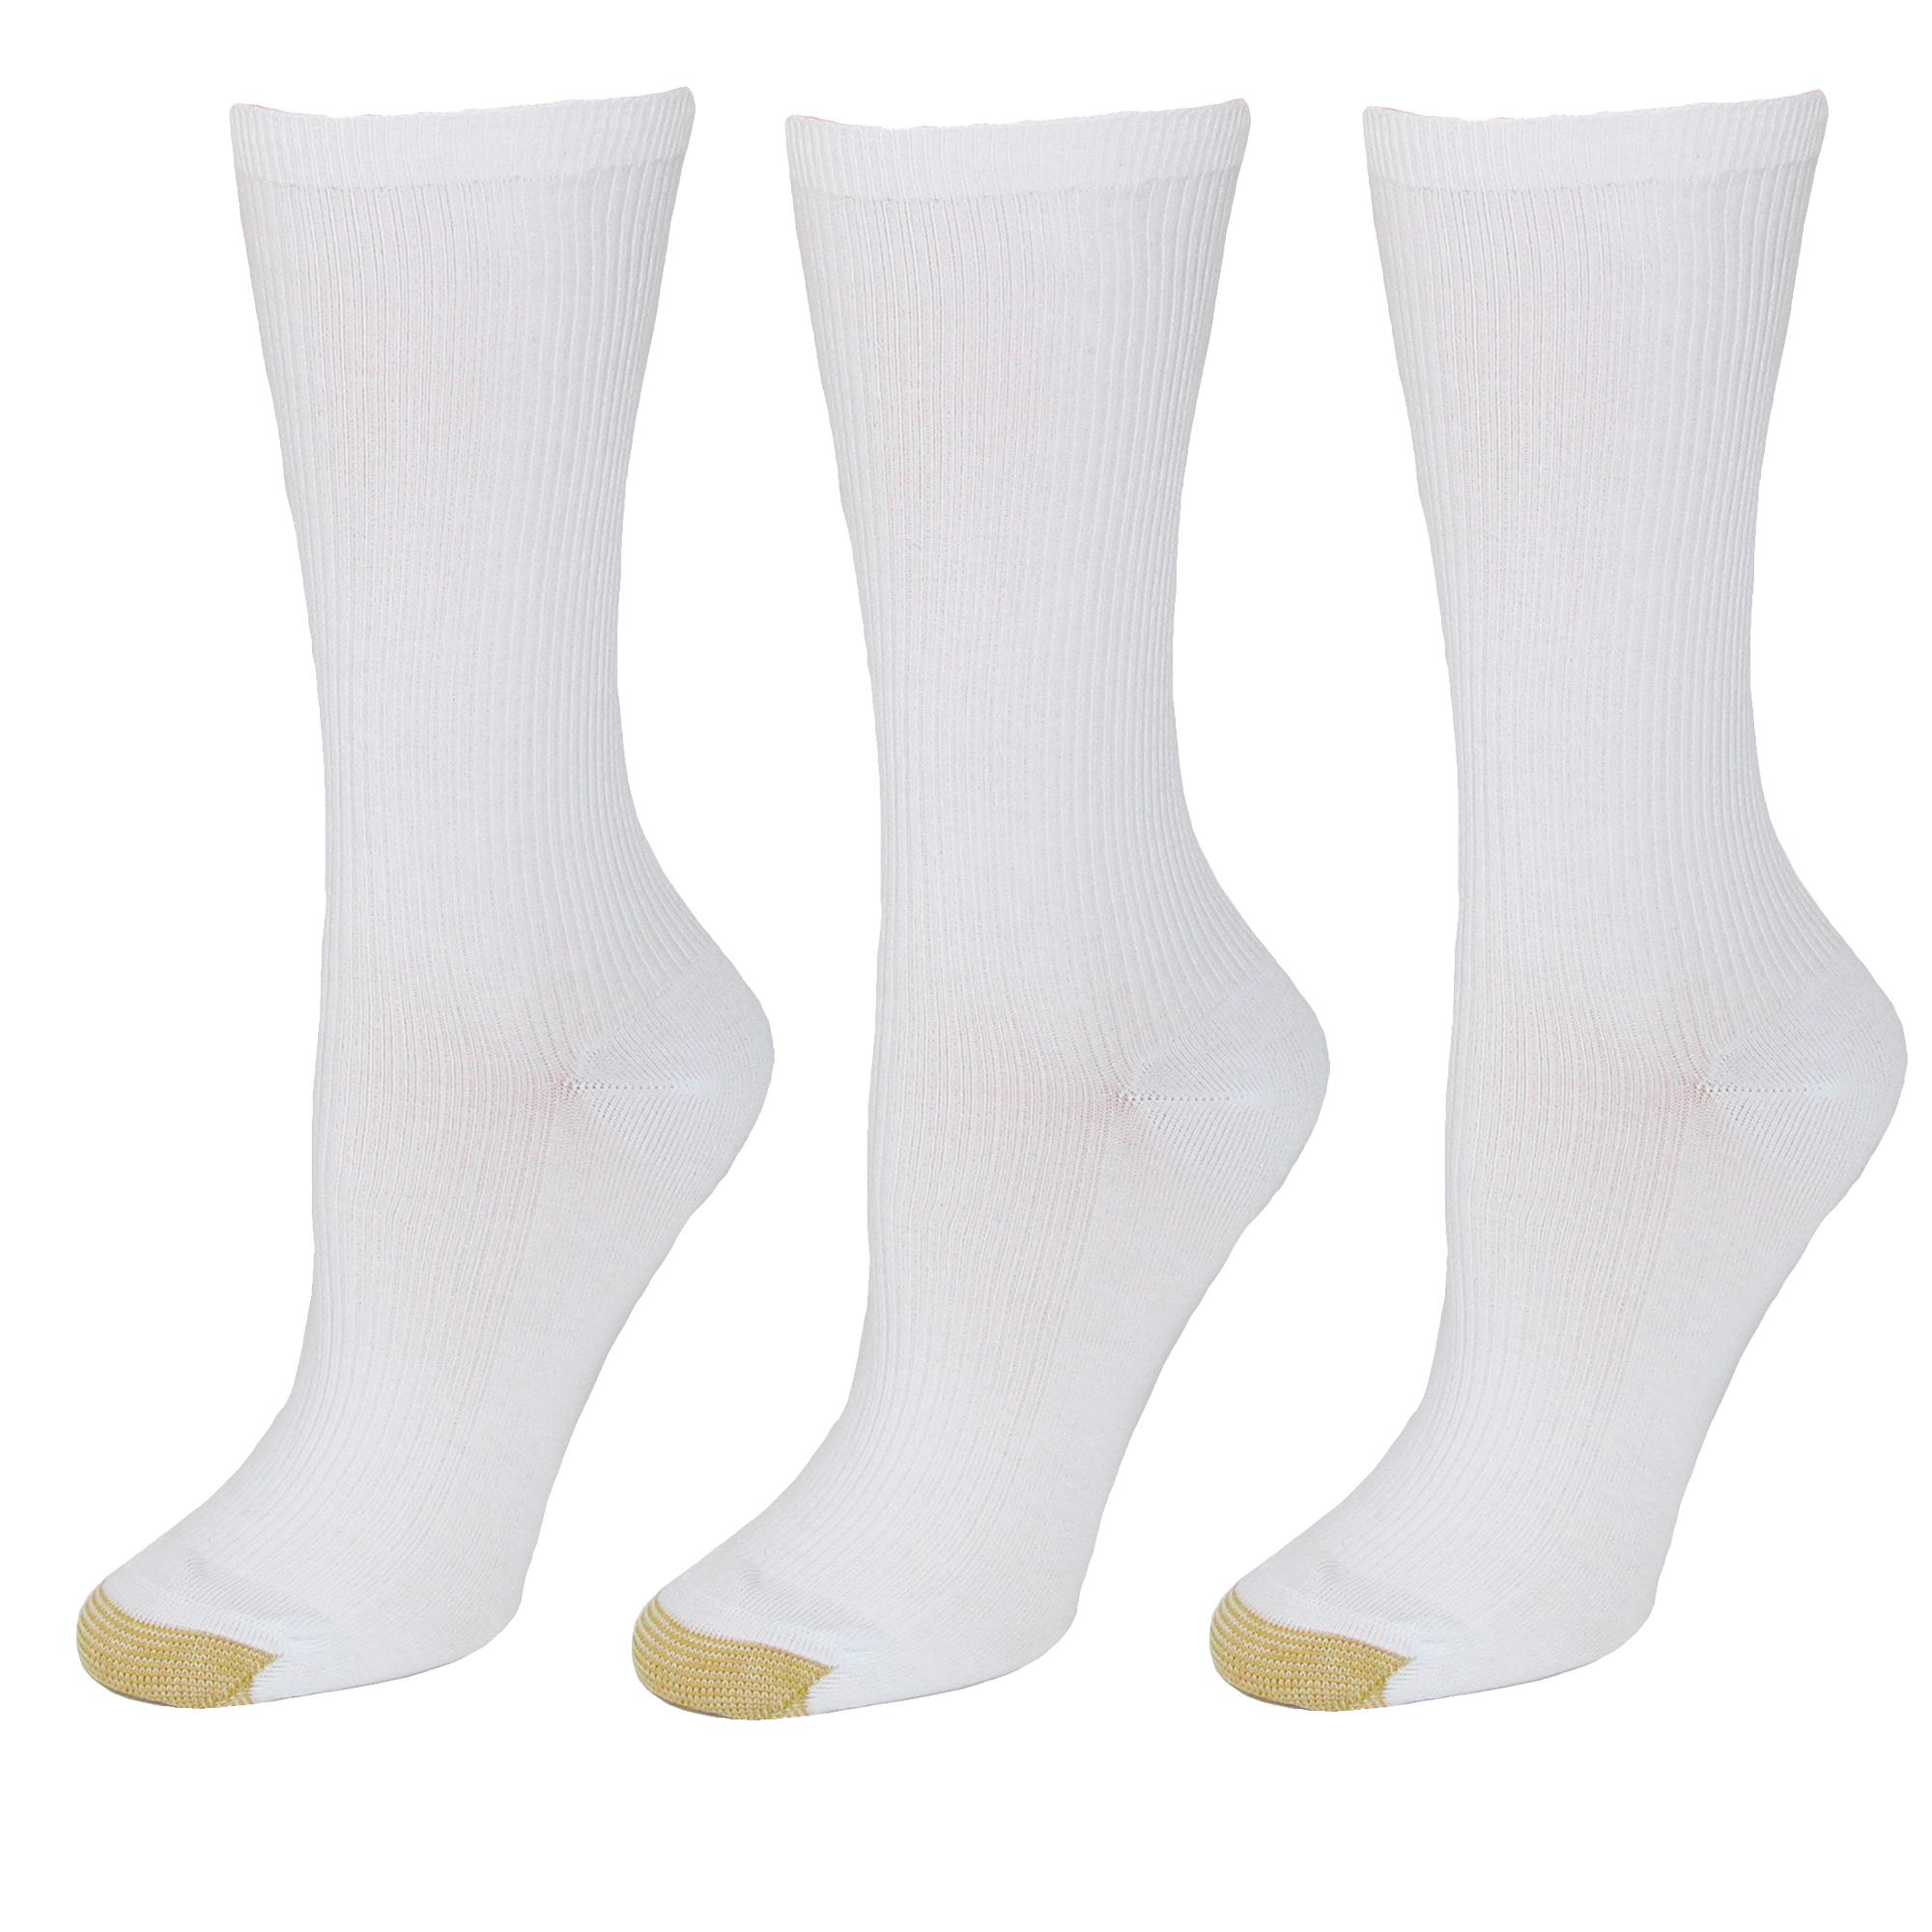 Gold Toe Womens Non Binding Ribbed Crew Socks (3 Pair Pack)